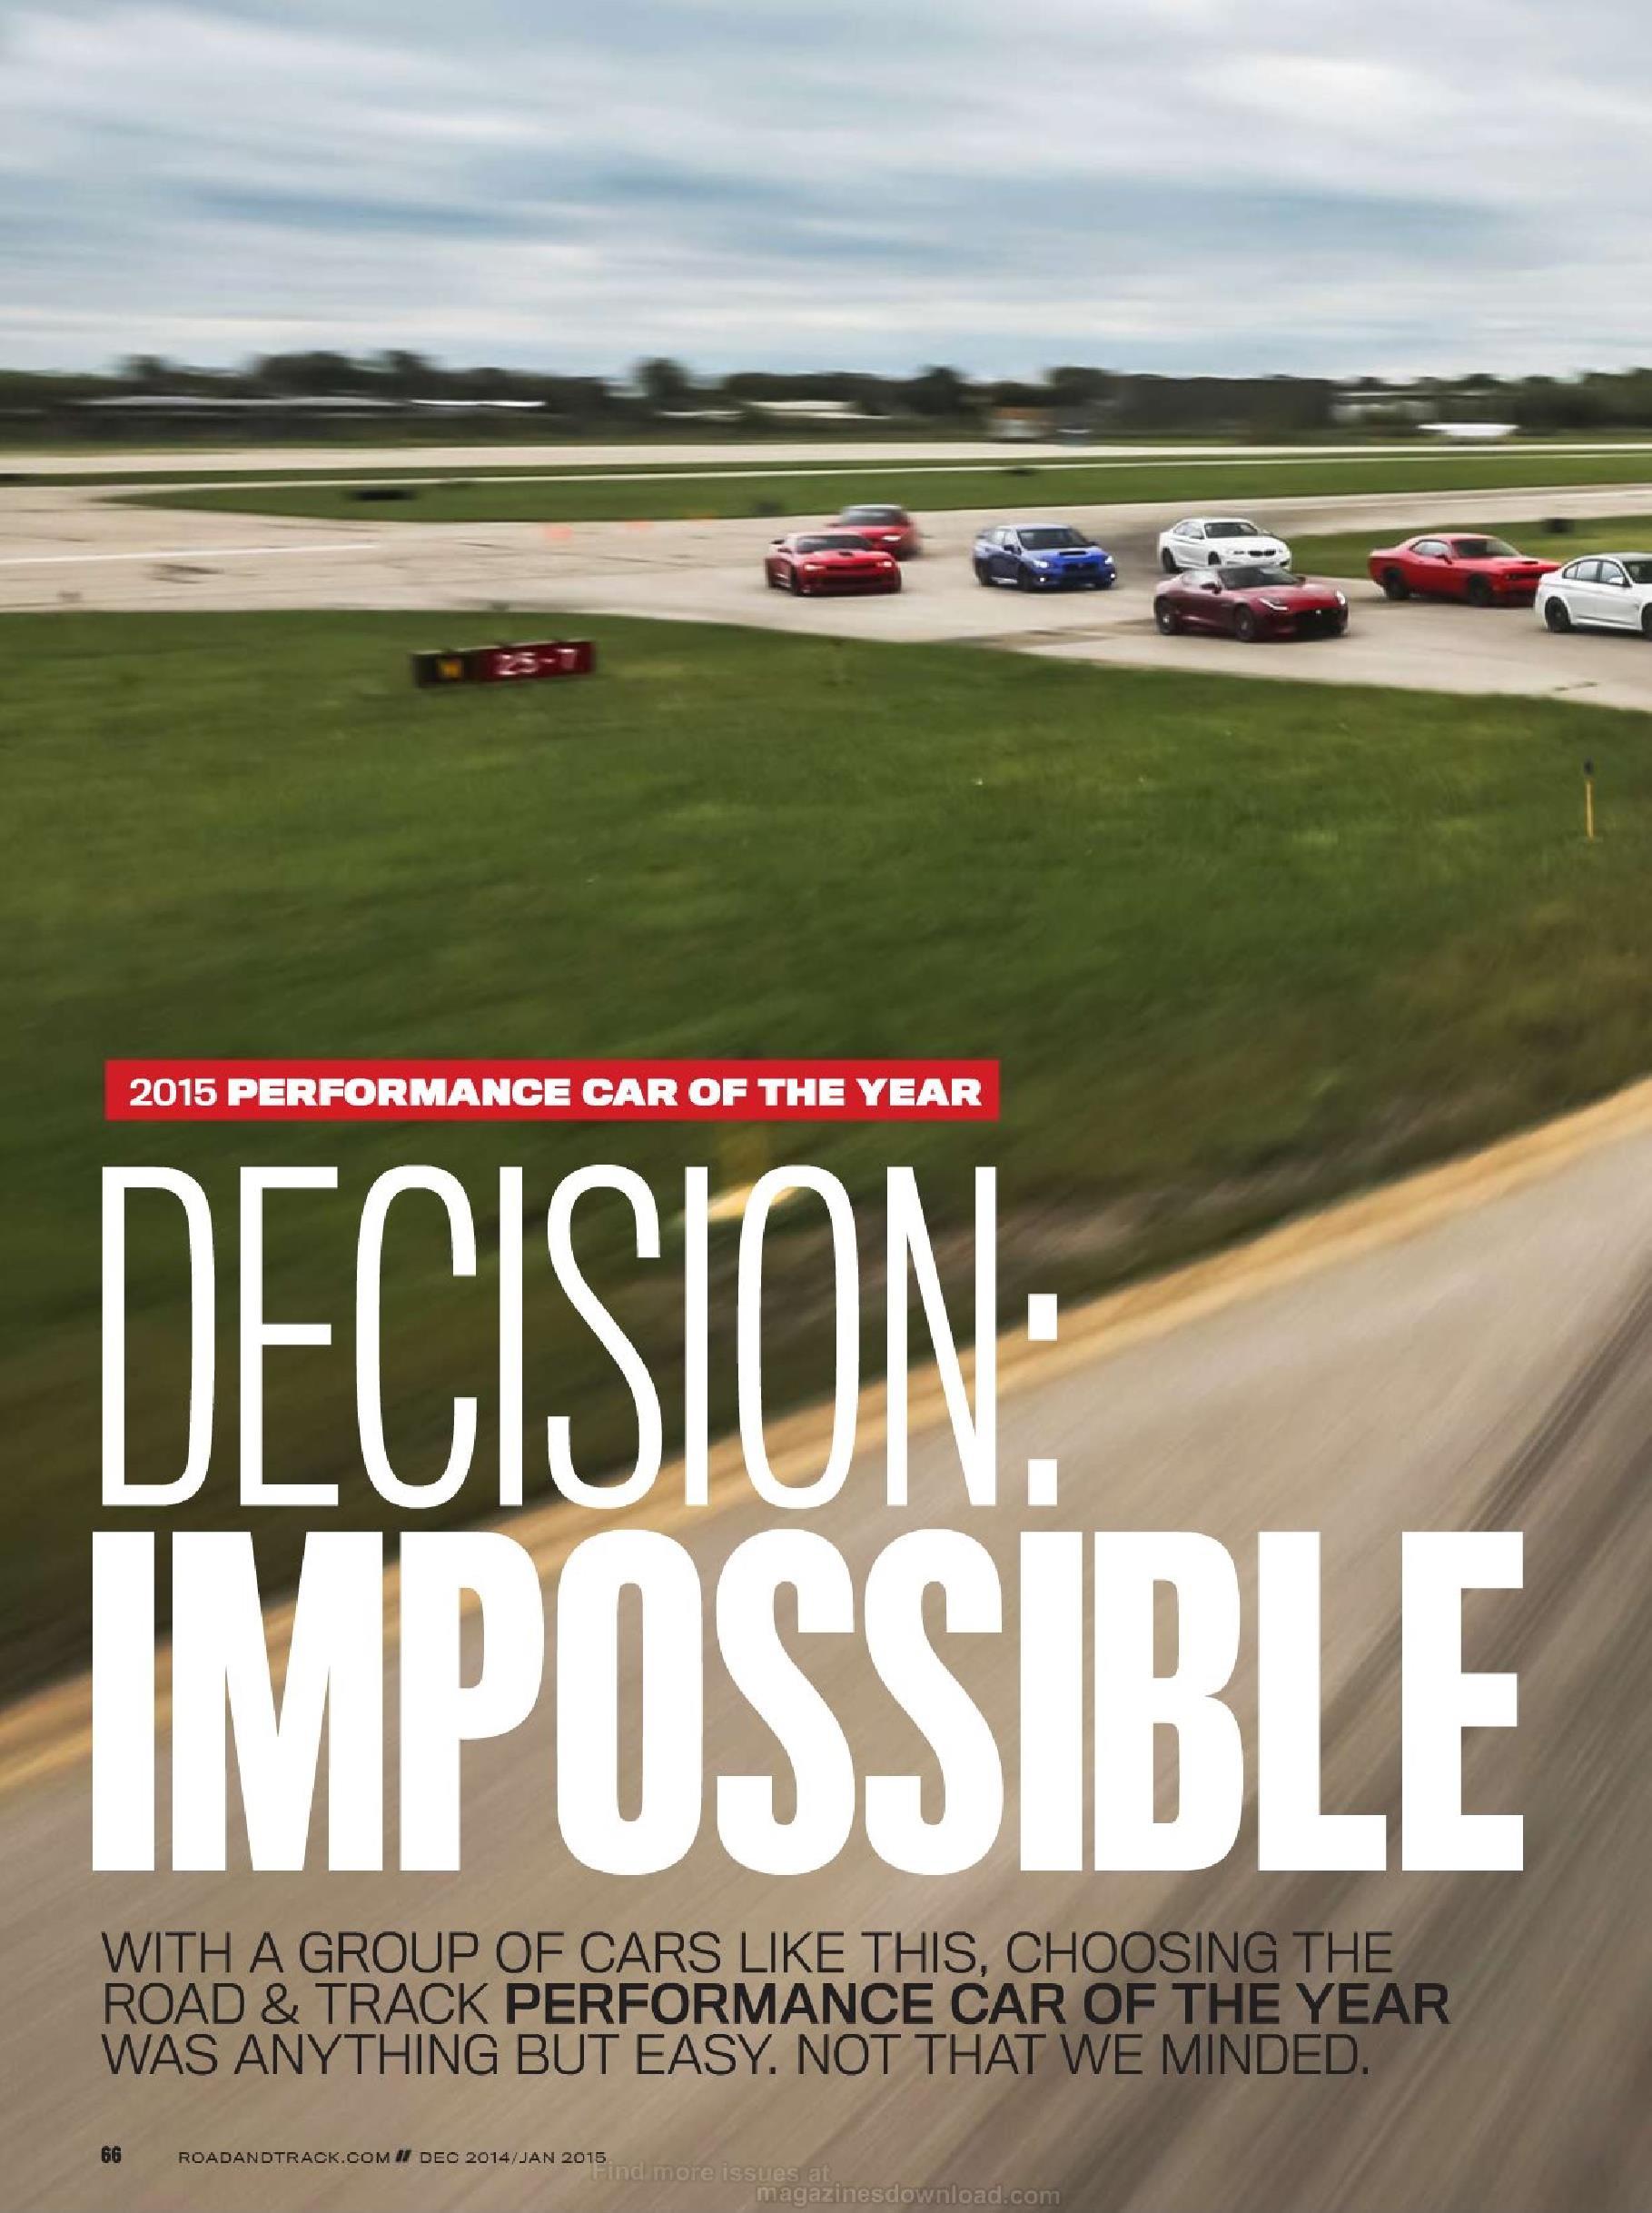 Porsche 991 GT3 vs AlfaRomeo 4C BMW M235 M3 Chevrolet Camaro